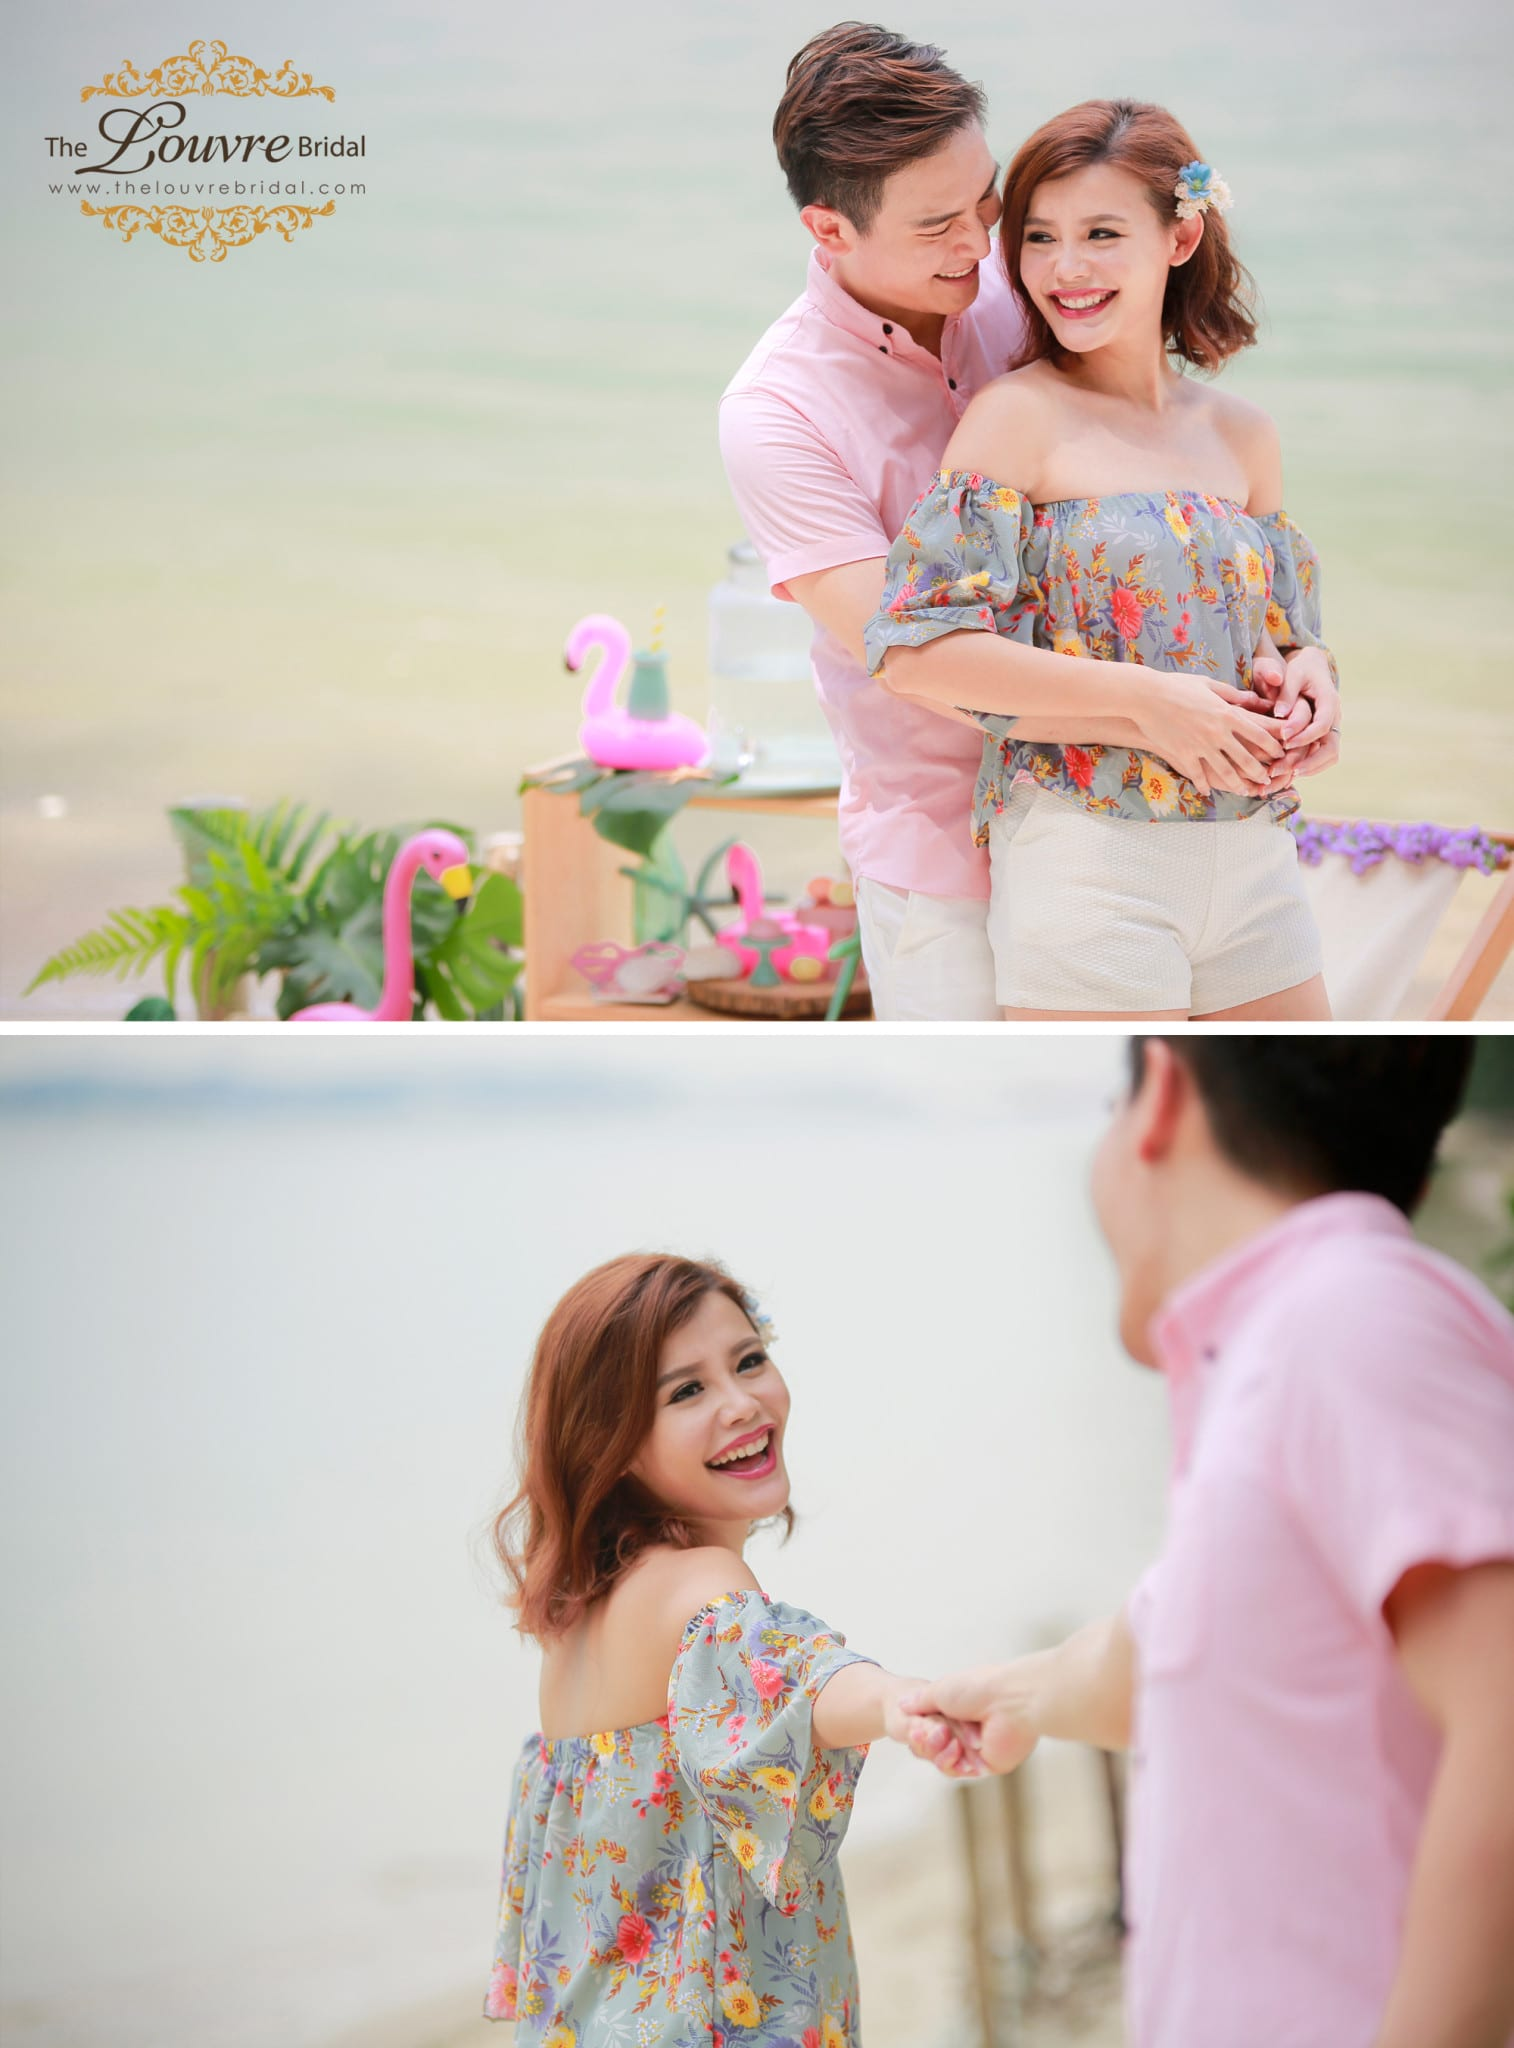 Pre-wedding Photoshoot - Newest Themes